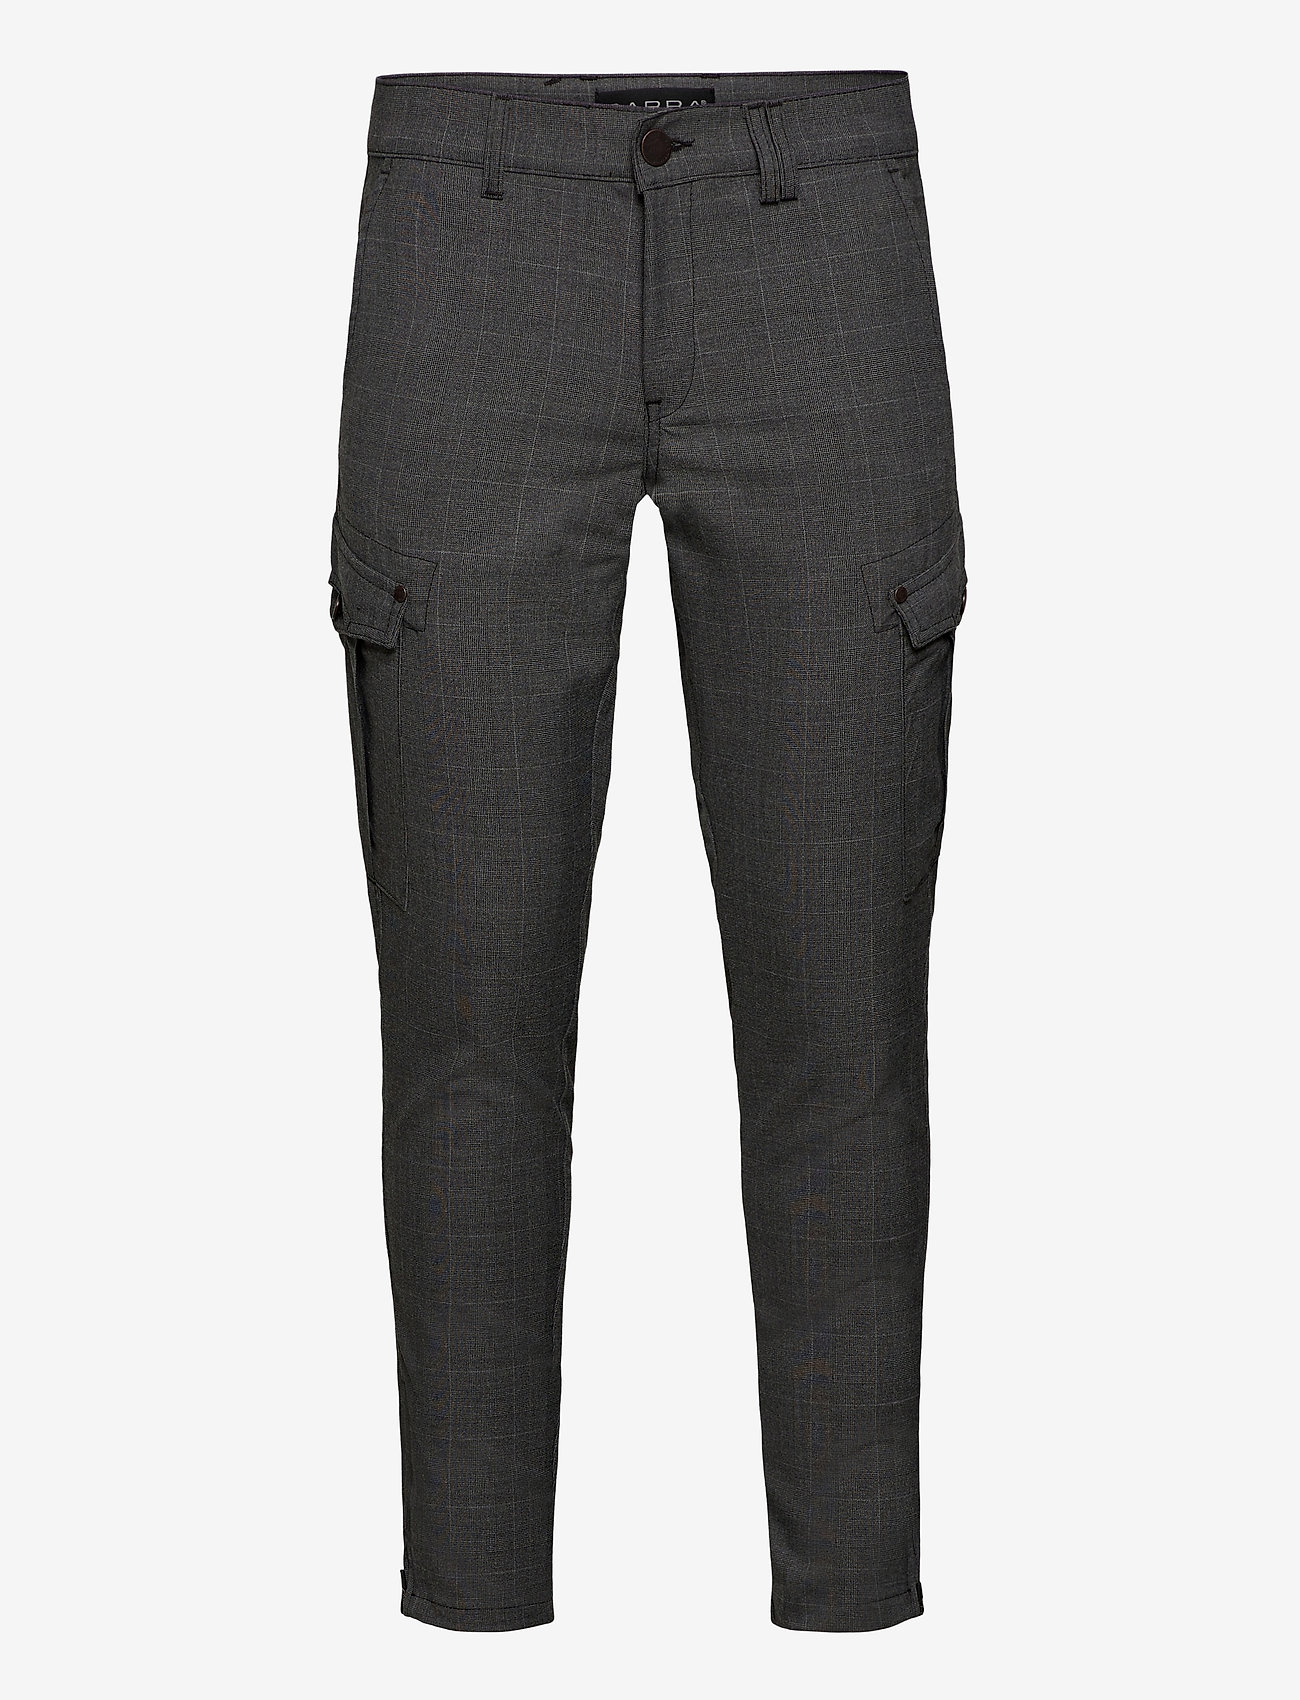 Gabba - Pisa Cargo Grey Check Pant - cargobukser - grey check - 0